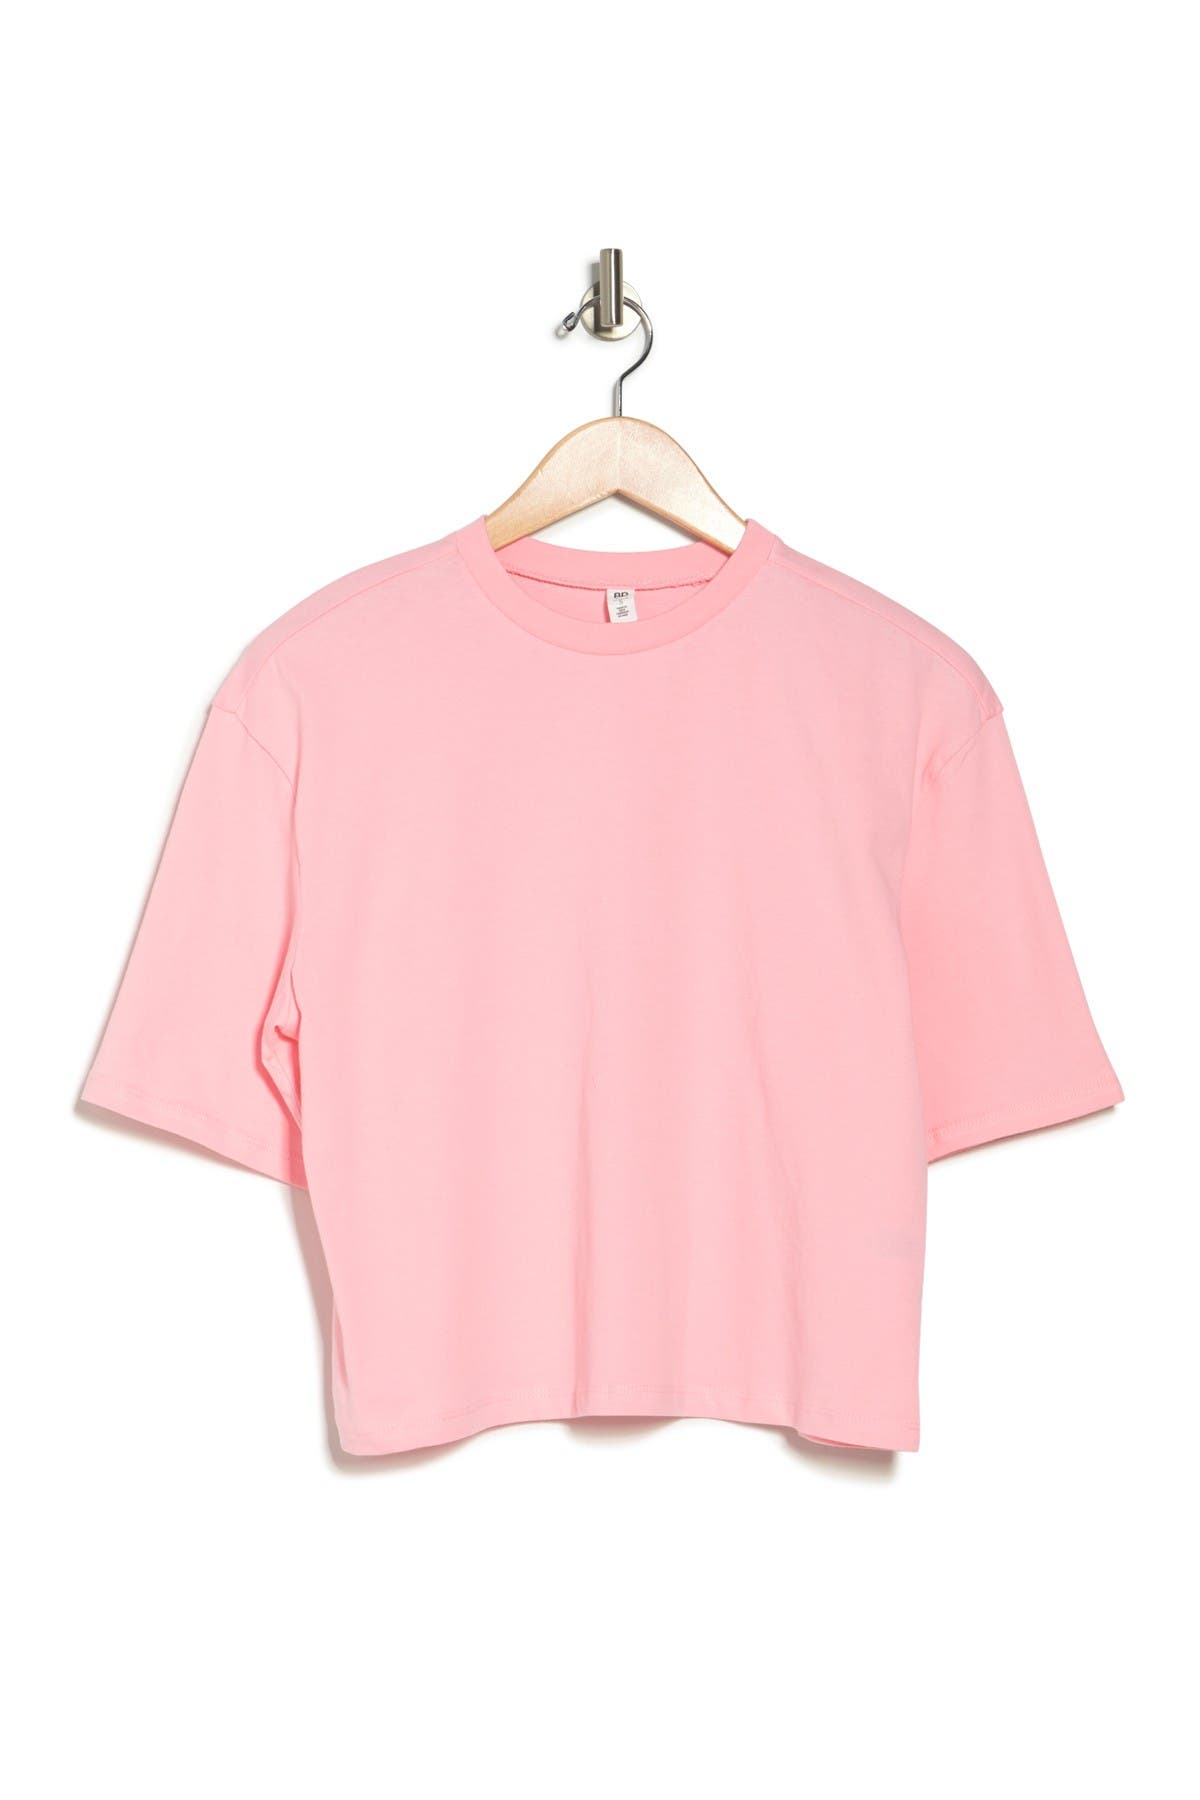 Bp. T-shirts COOL GIRL CREW NECK T-SHIRT